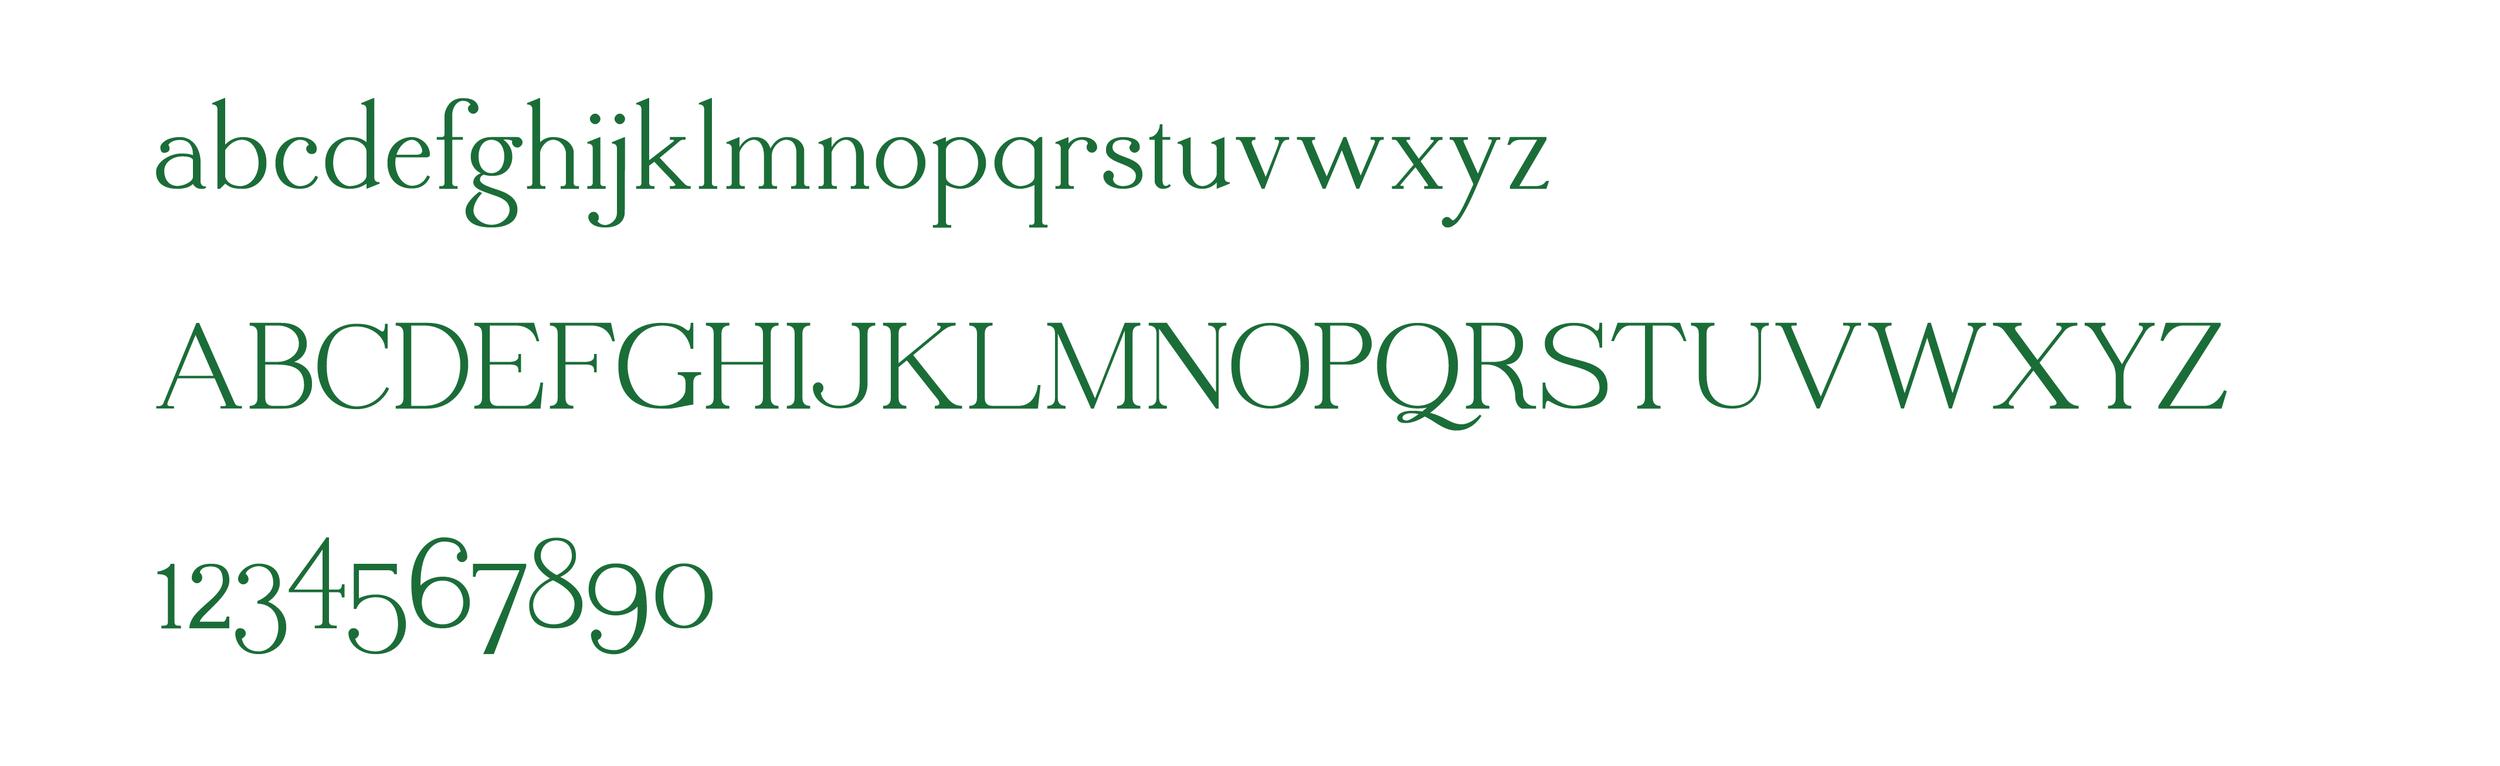 Quaver Serif Regular